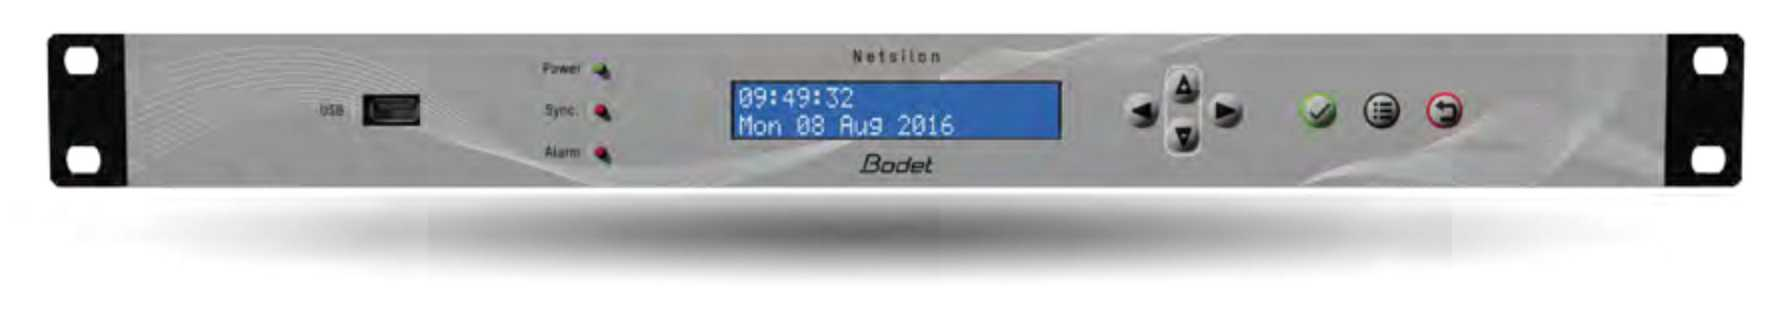 NETSILON 7 - Serwer NTP